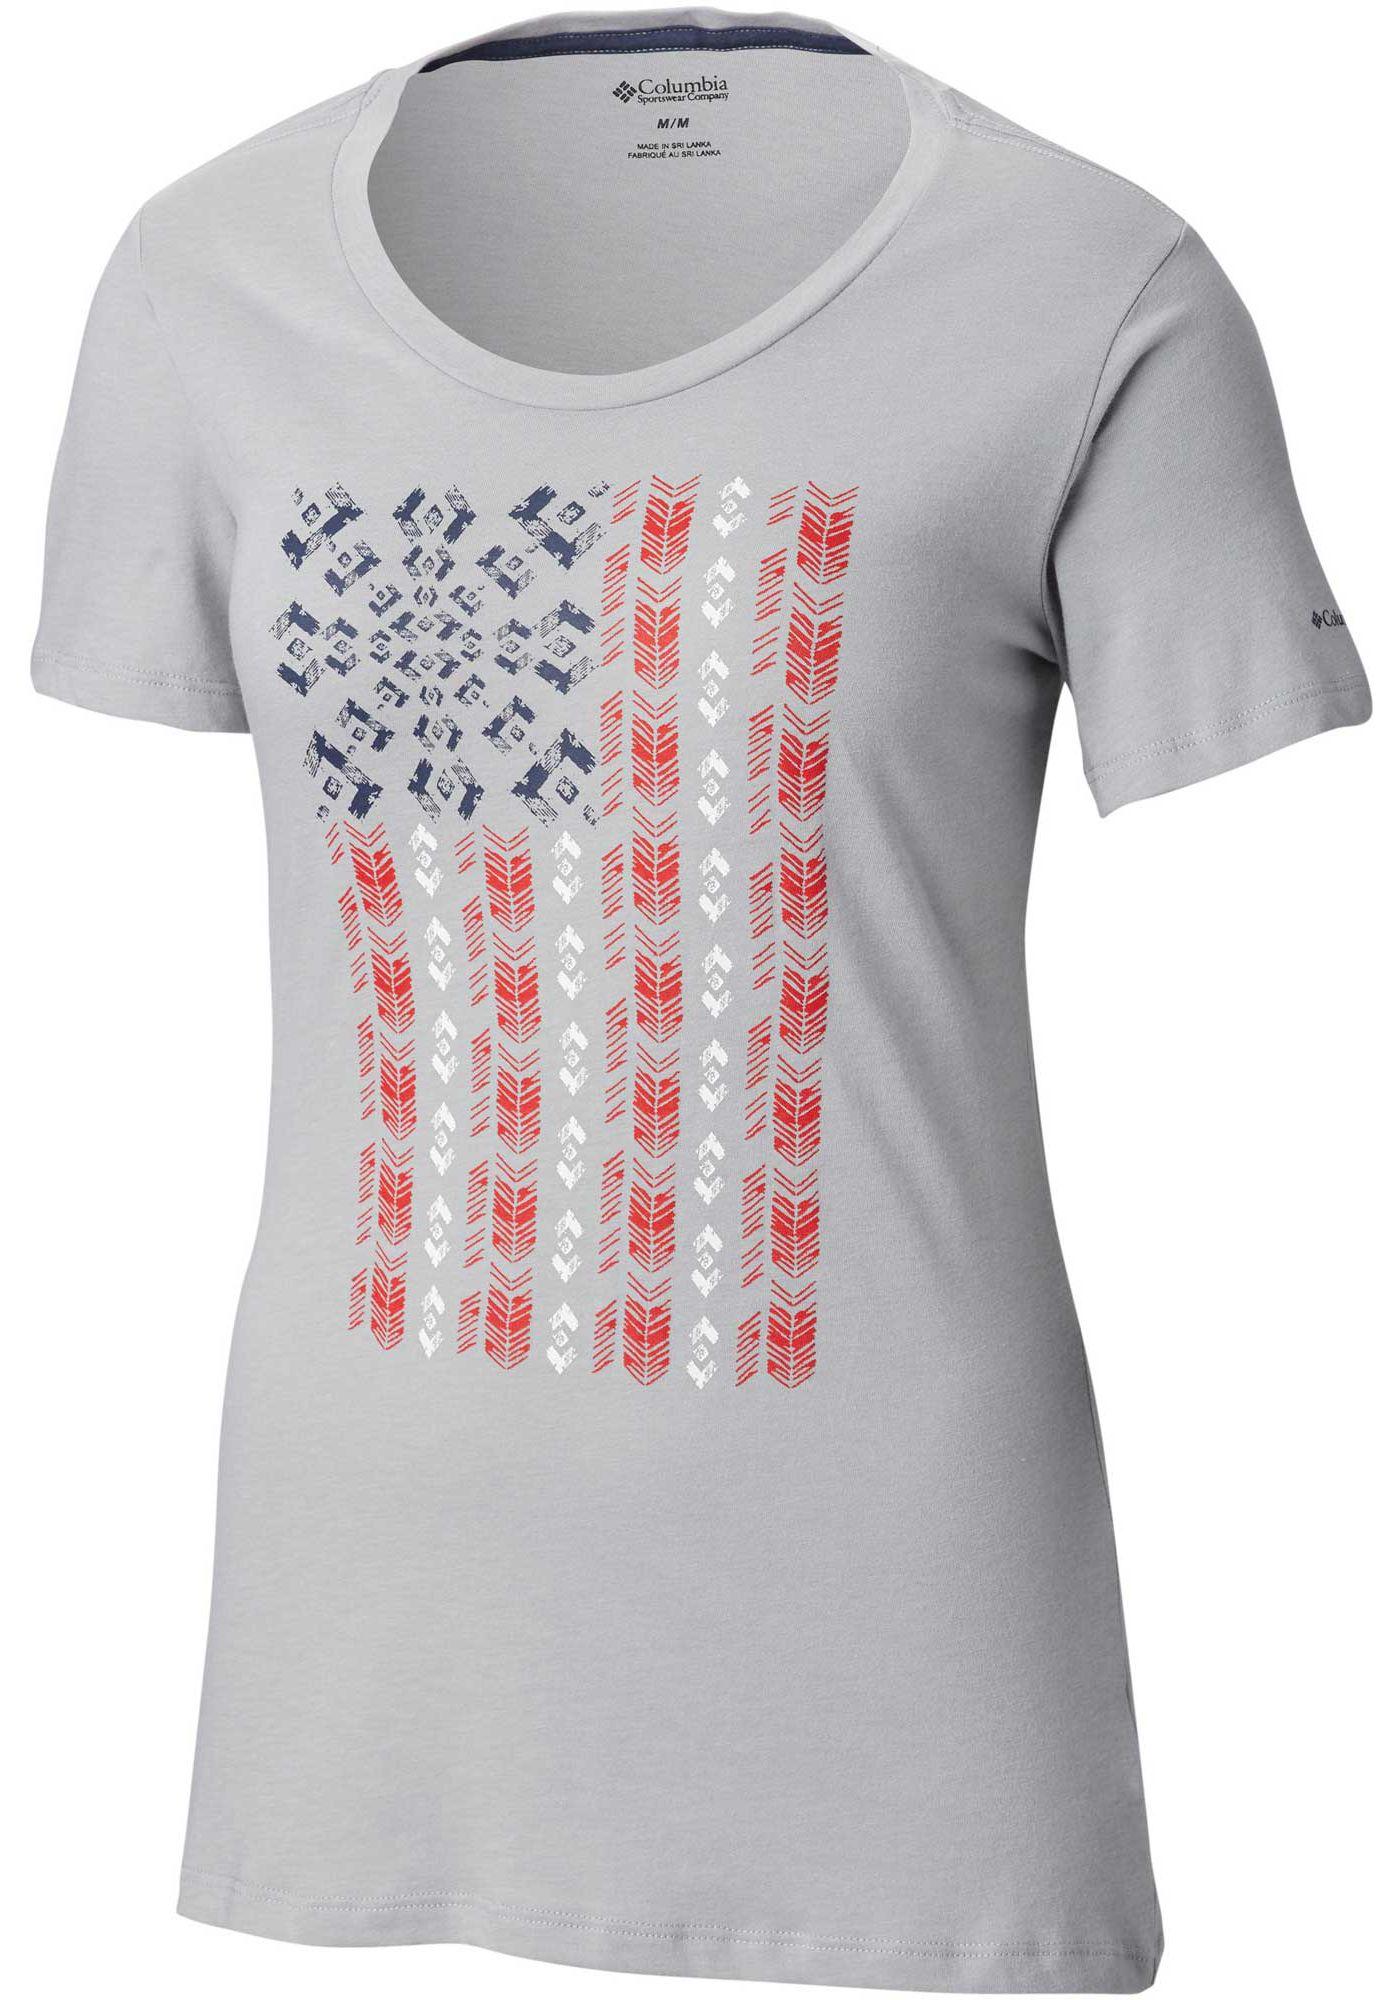 Columbia Women's Show Your Flag T-Shirt